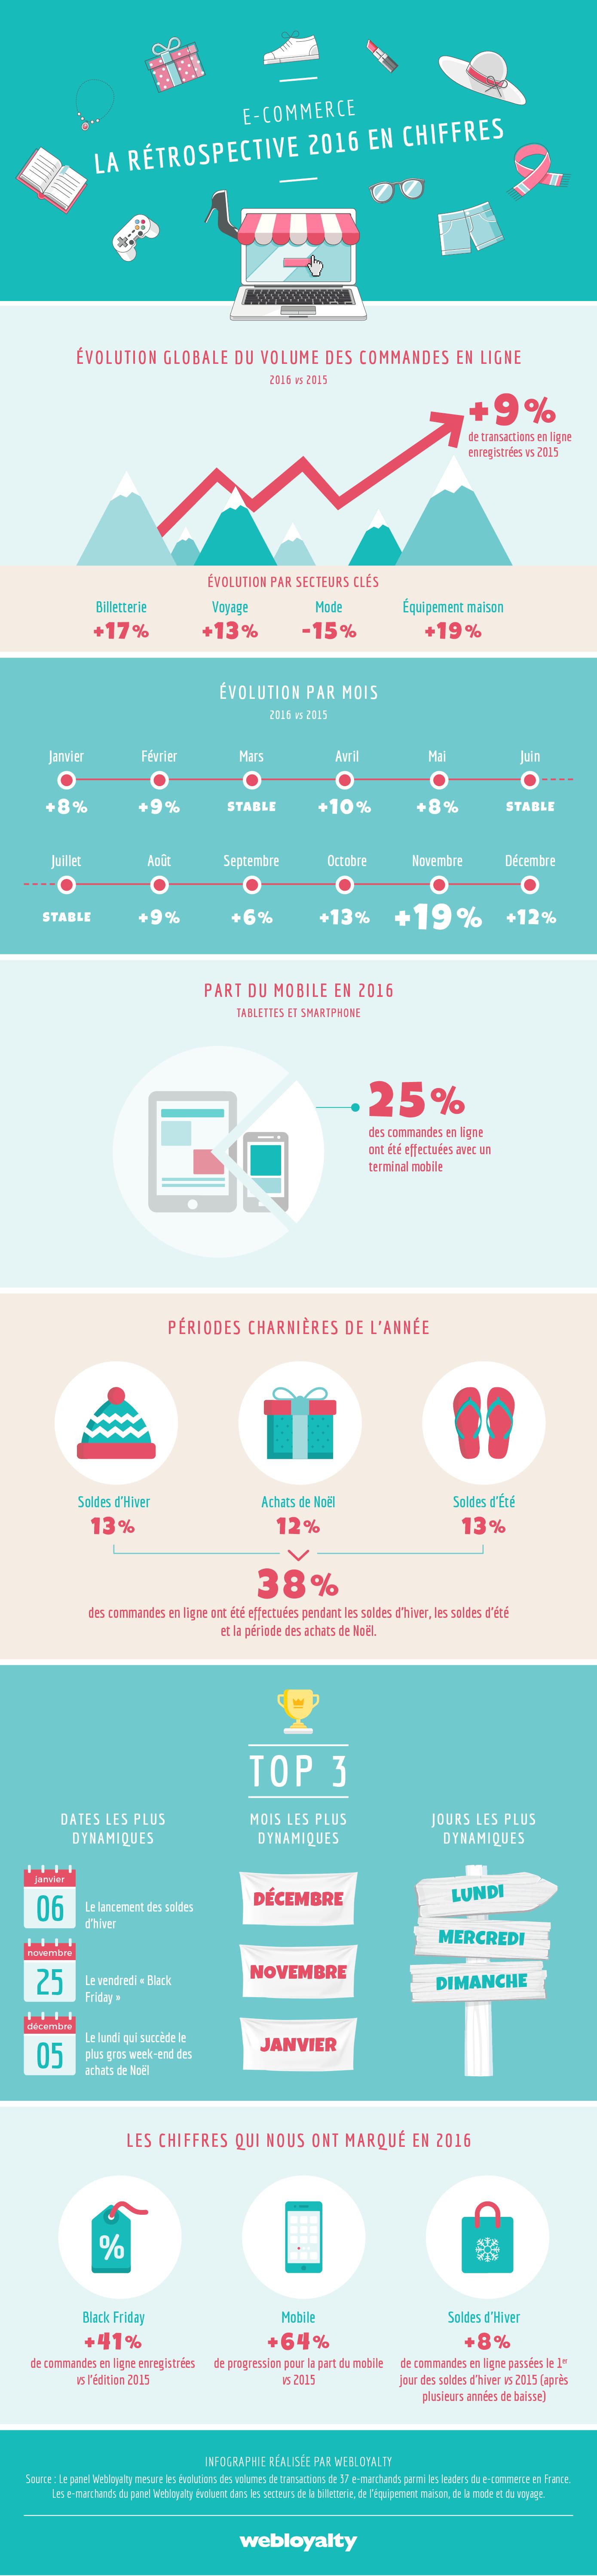 Webloyalty-infographie-retro-ecommerce